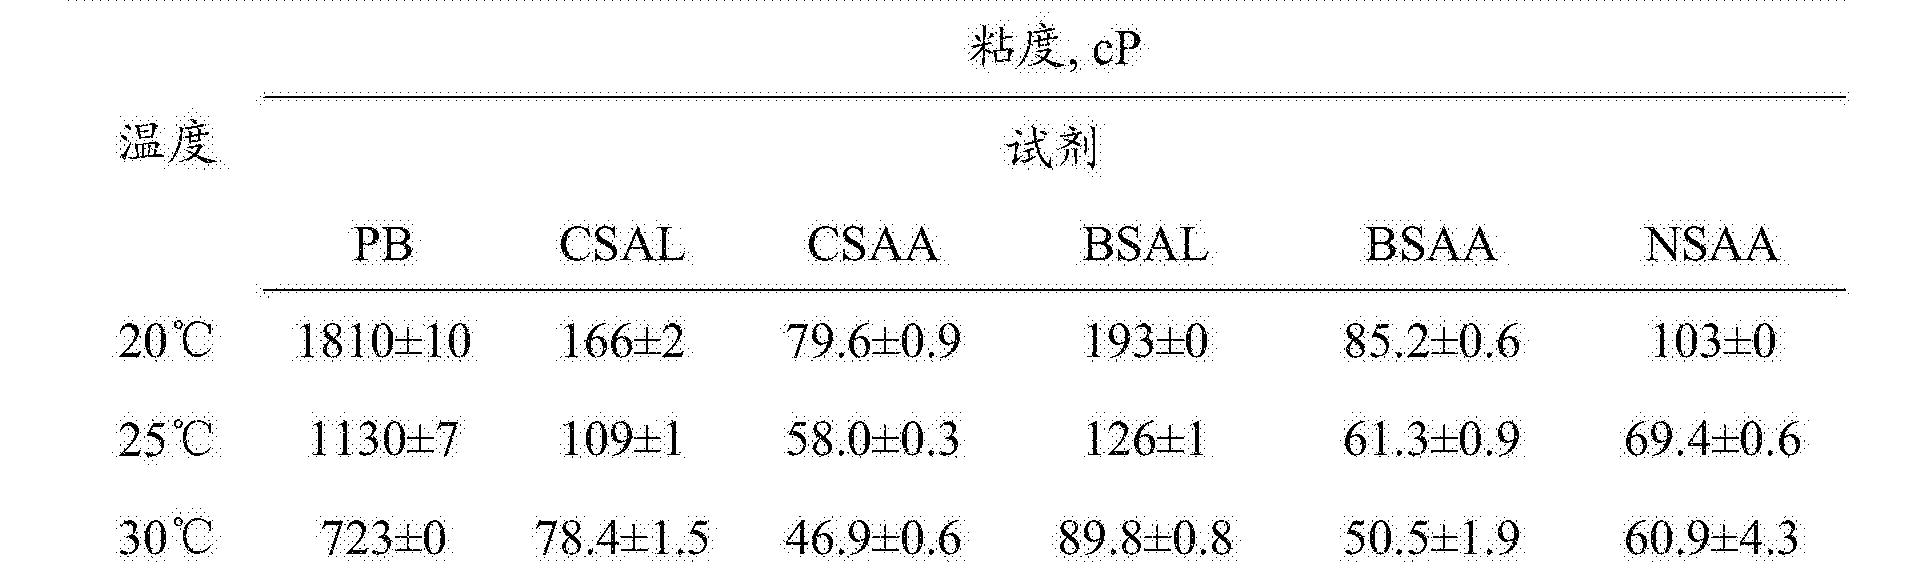 CN105722501A - Liquid protein formulations containing viscosity